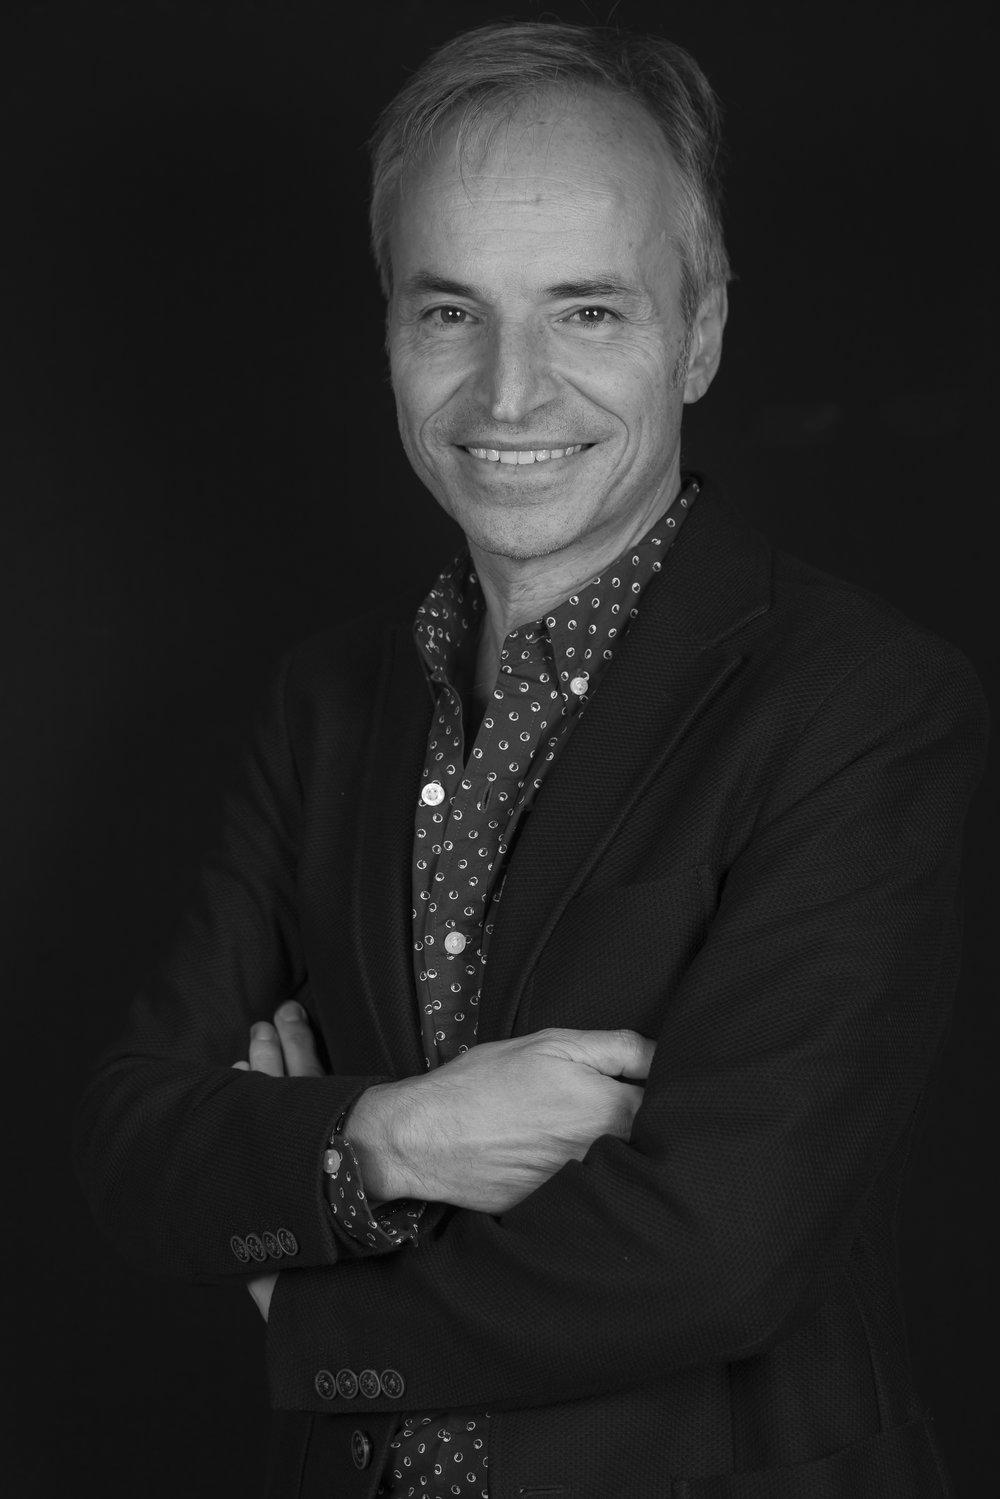 Dov Seknazy